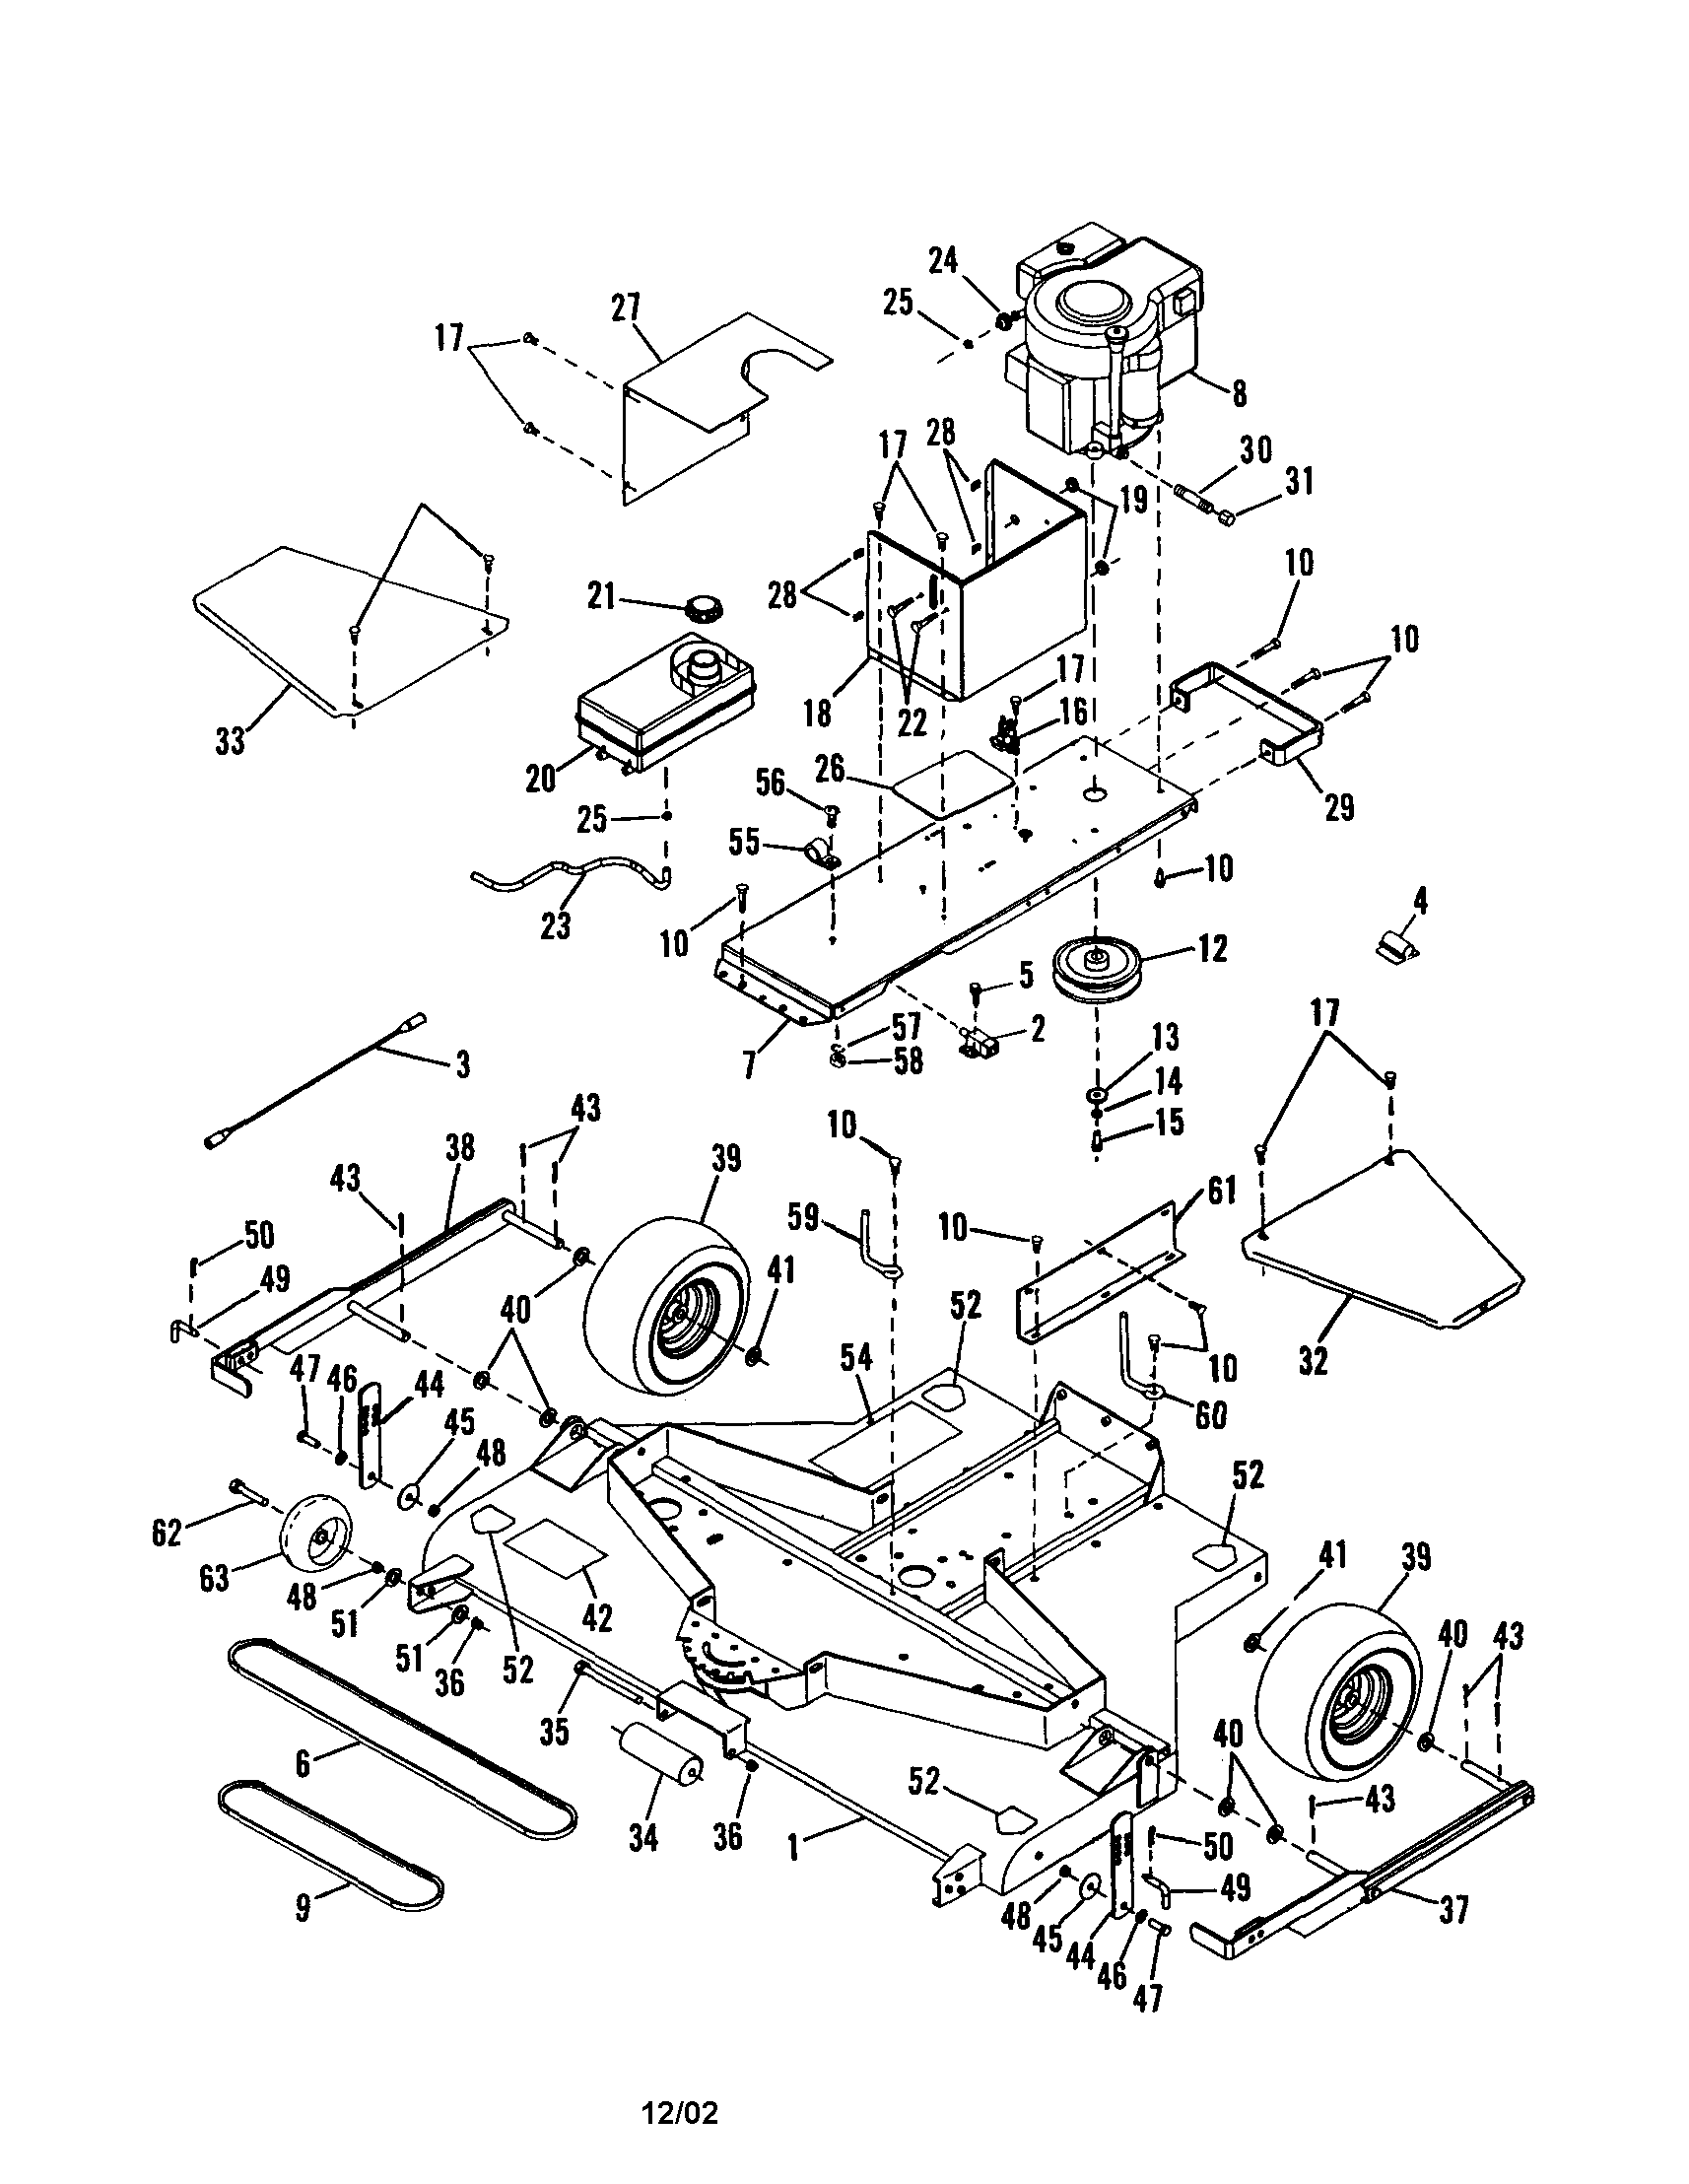 Gmc Duramax Sel Diagram GMC Cummins Wiring Diagram ~ Odicis